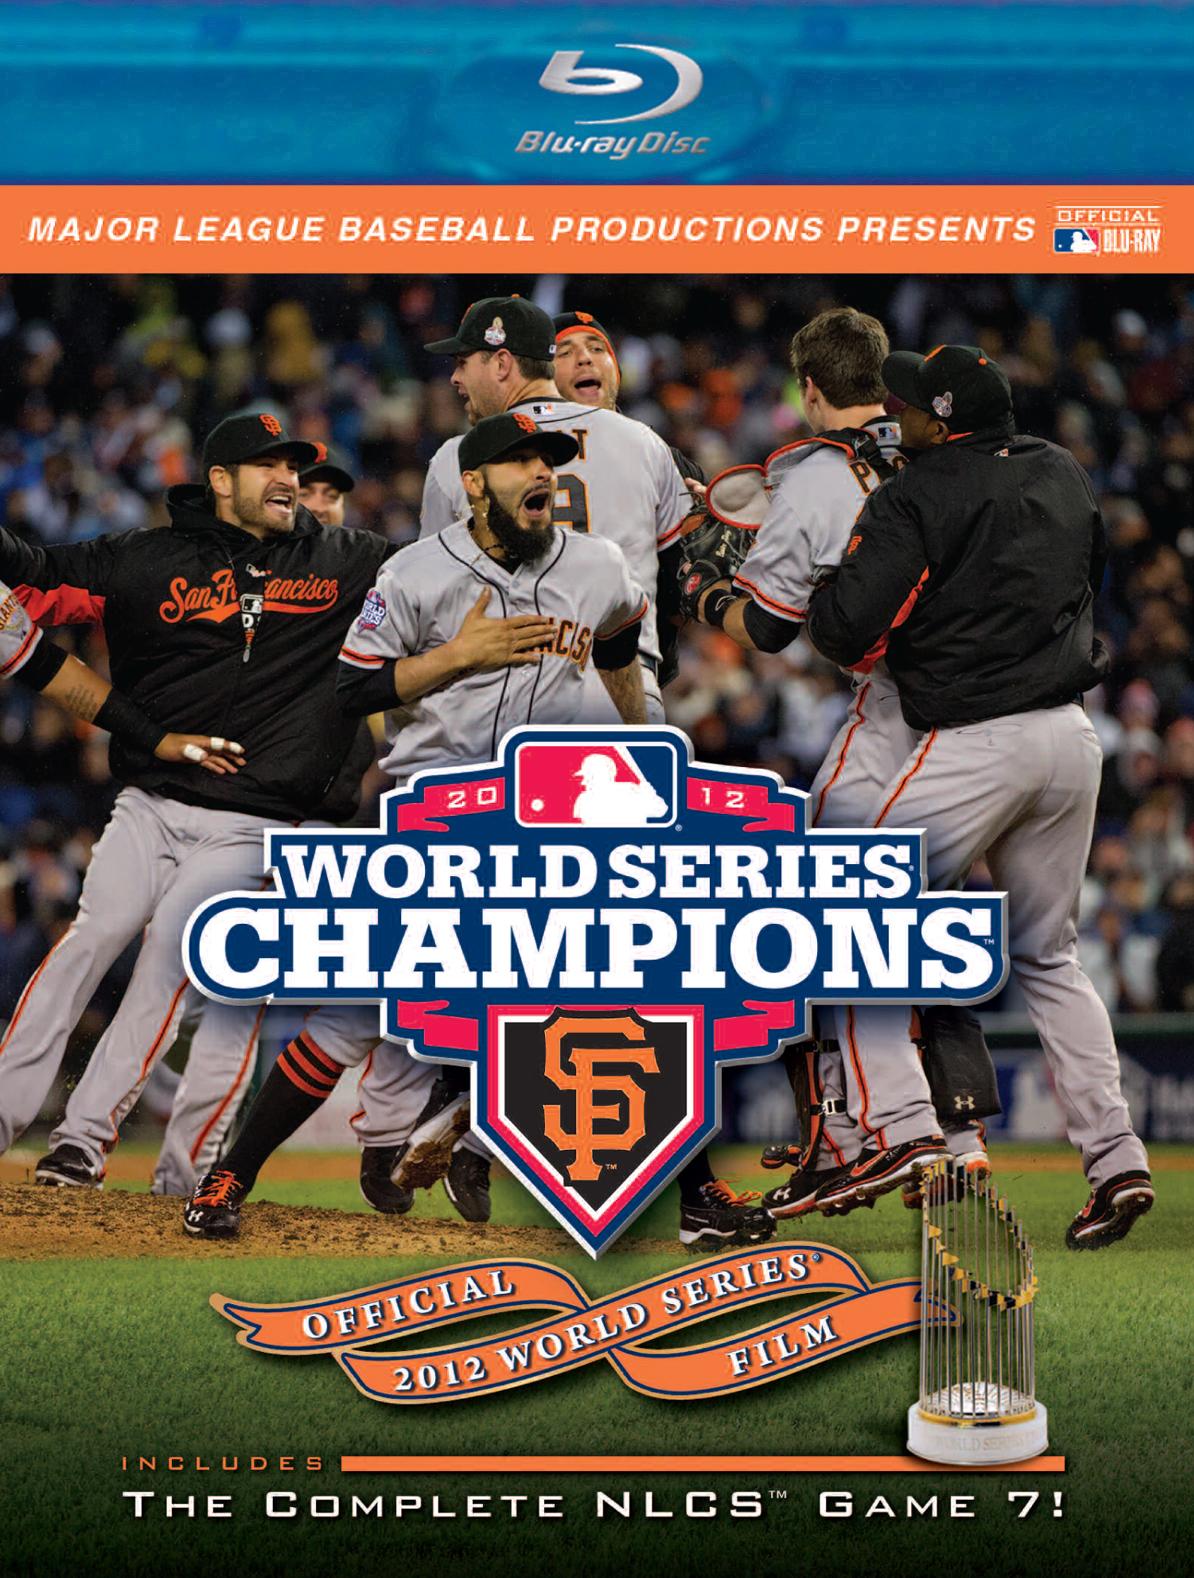 MLB: Official 2012 World Series Film